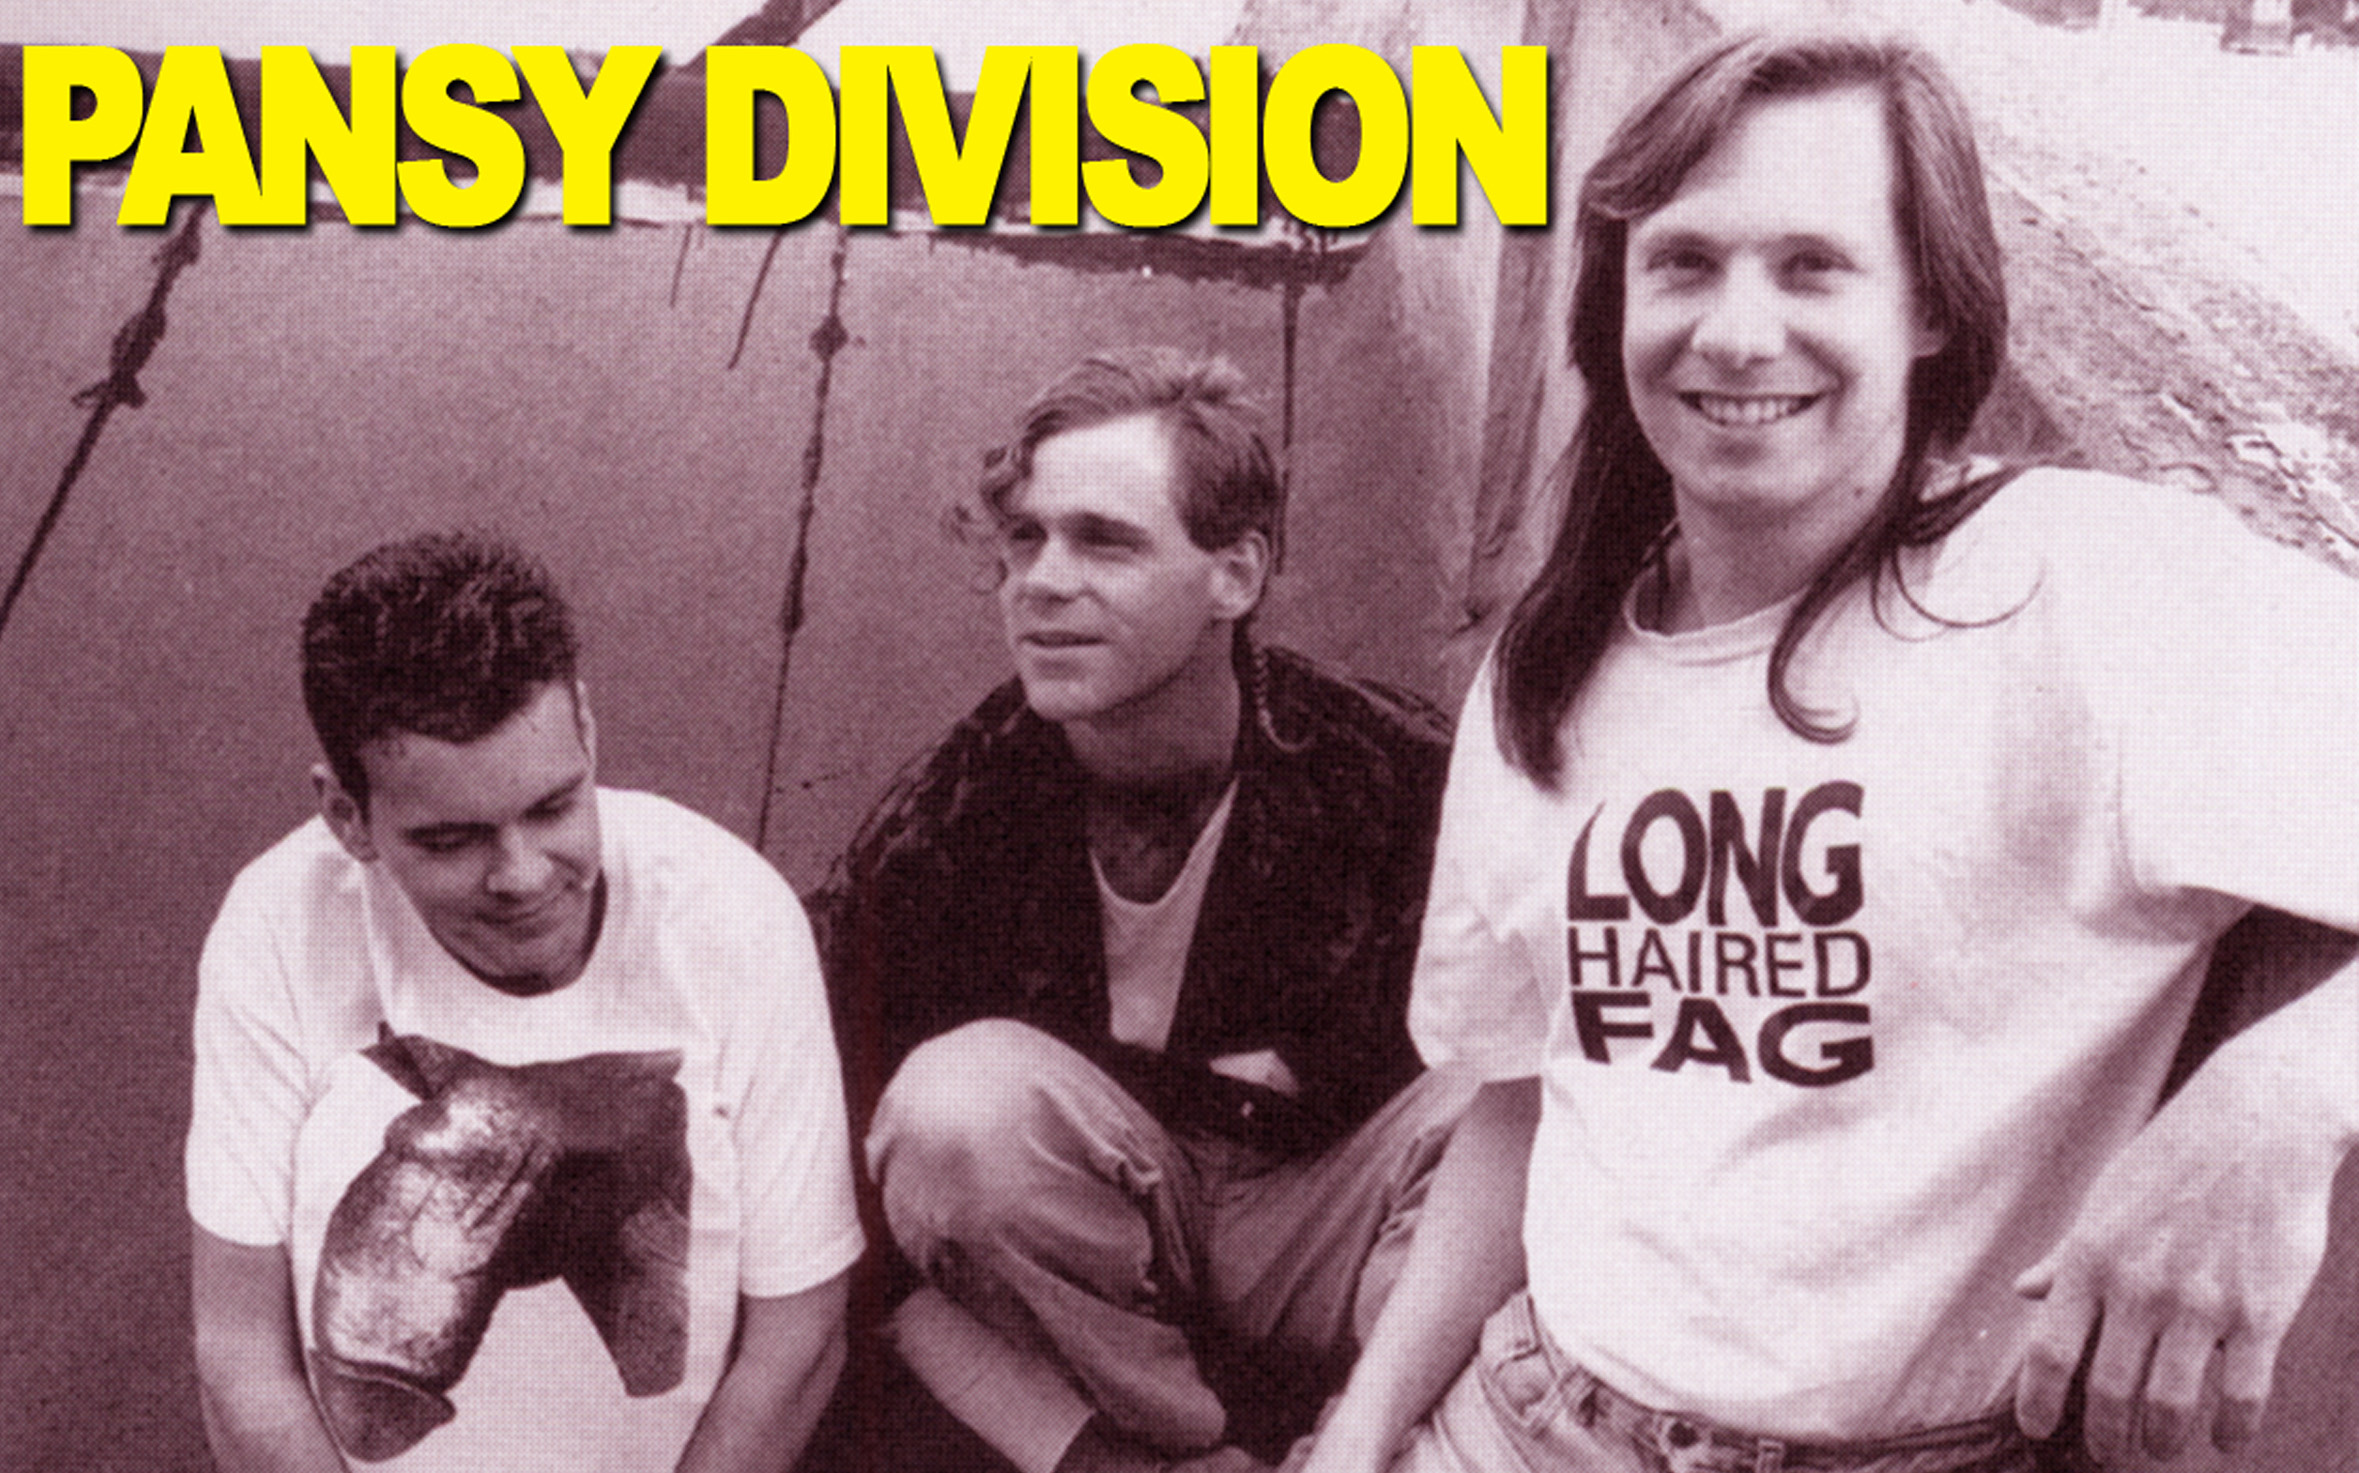 Gay punk band pansies